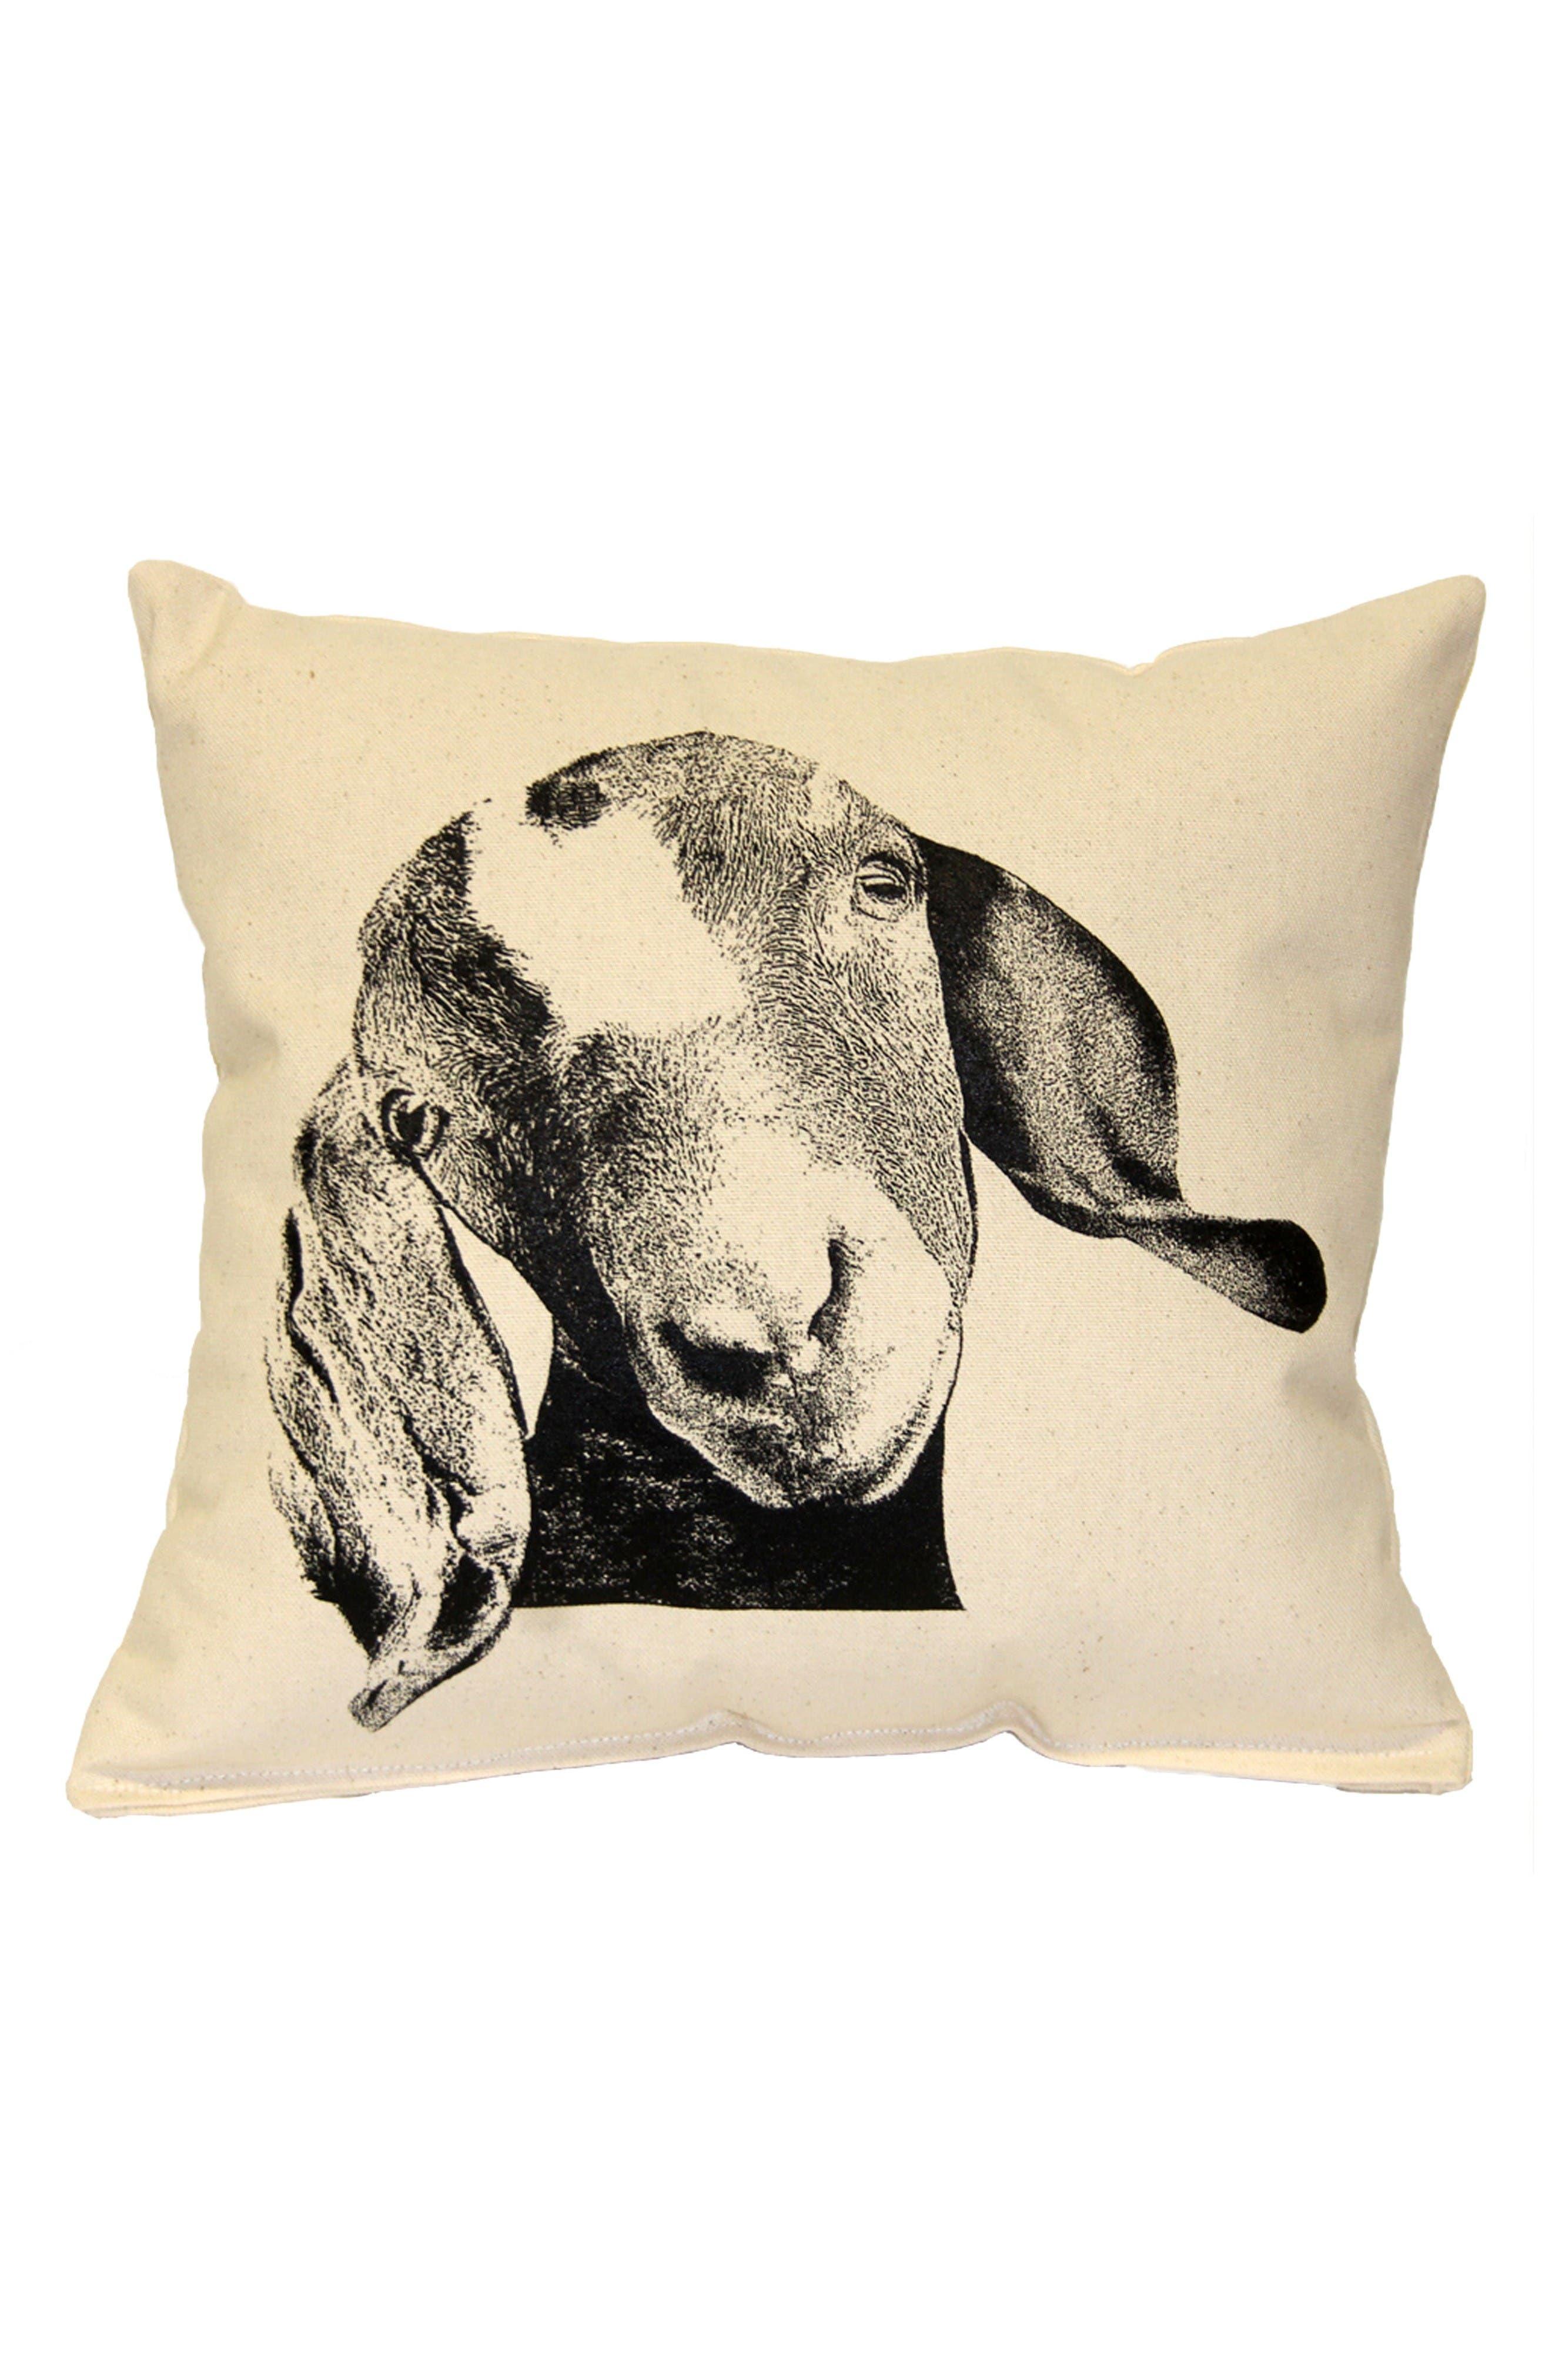 Animal Accent Pillow,                             Main thumbnail 1, color,                             Goat